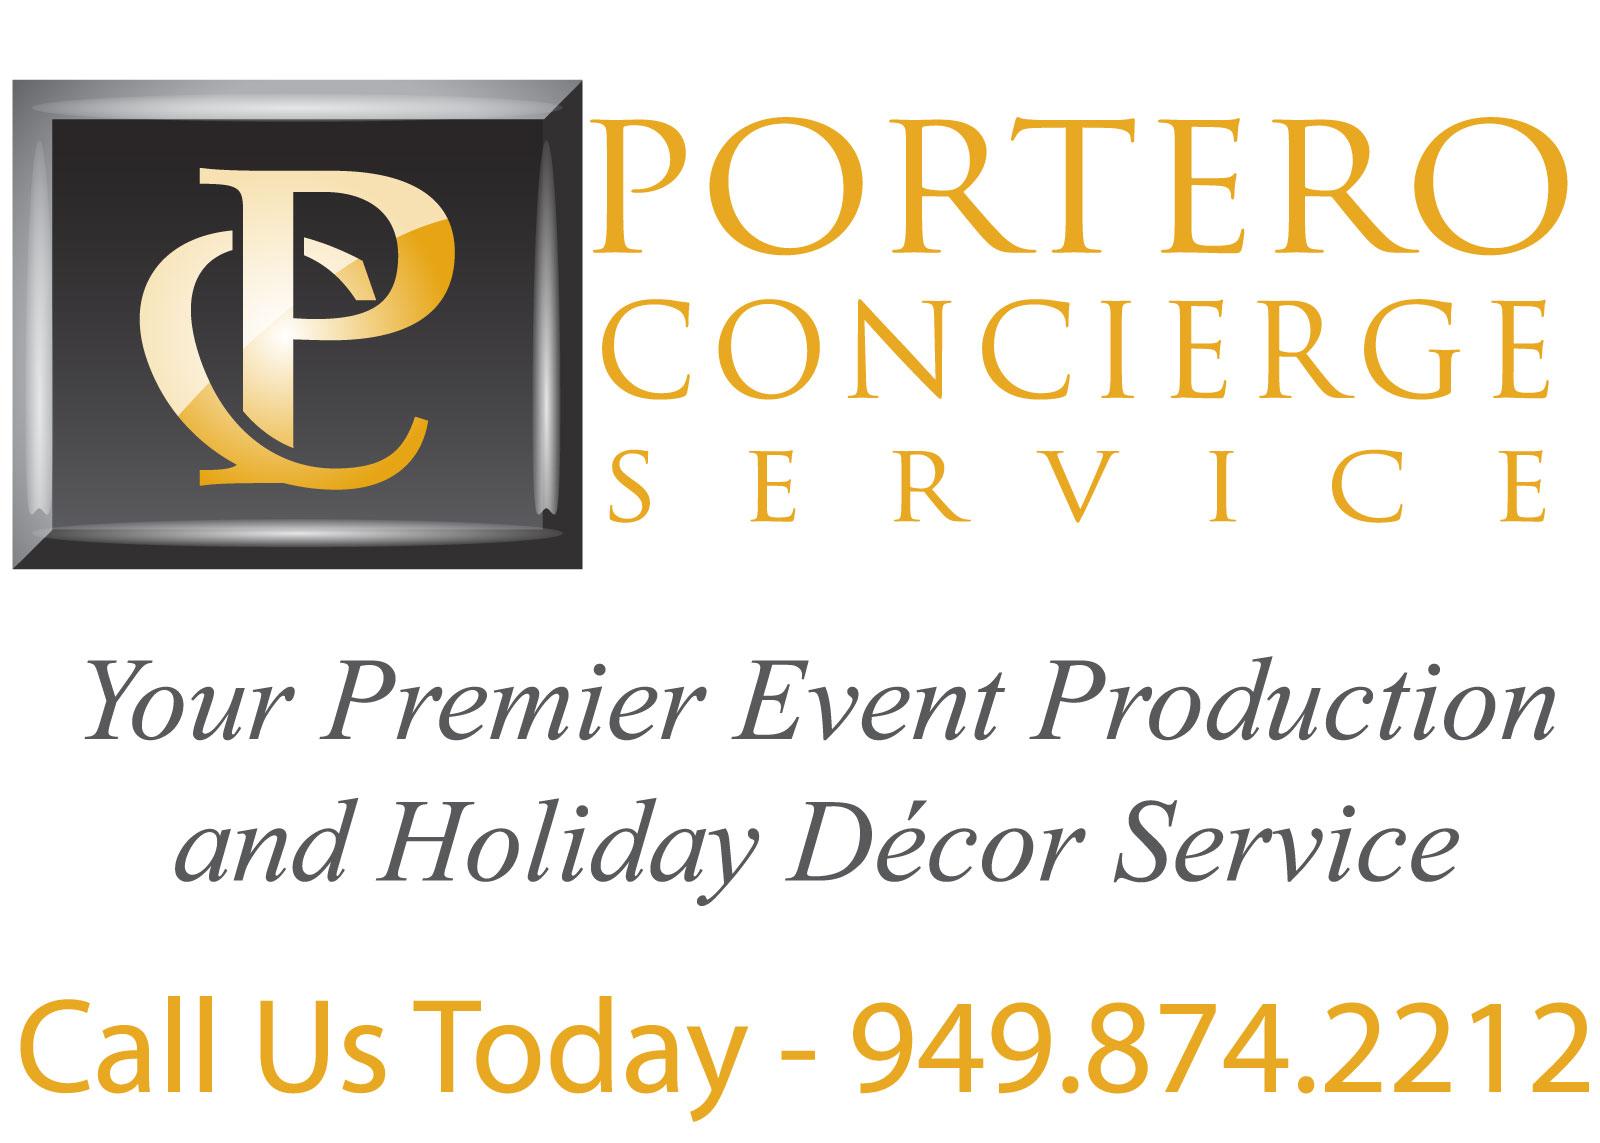 Portero Concierge logo and contact information